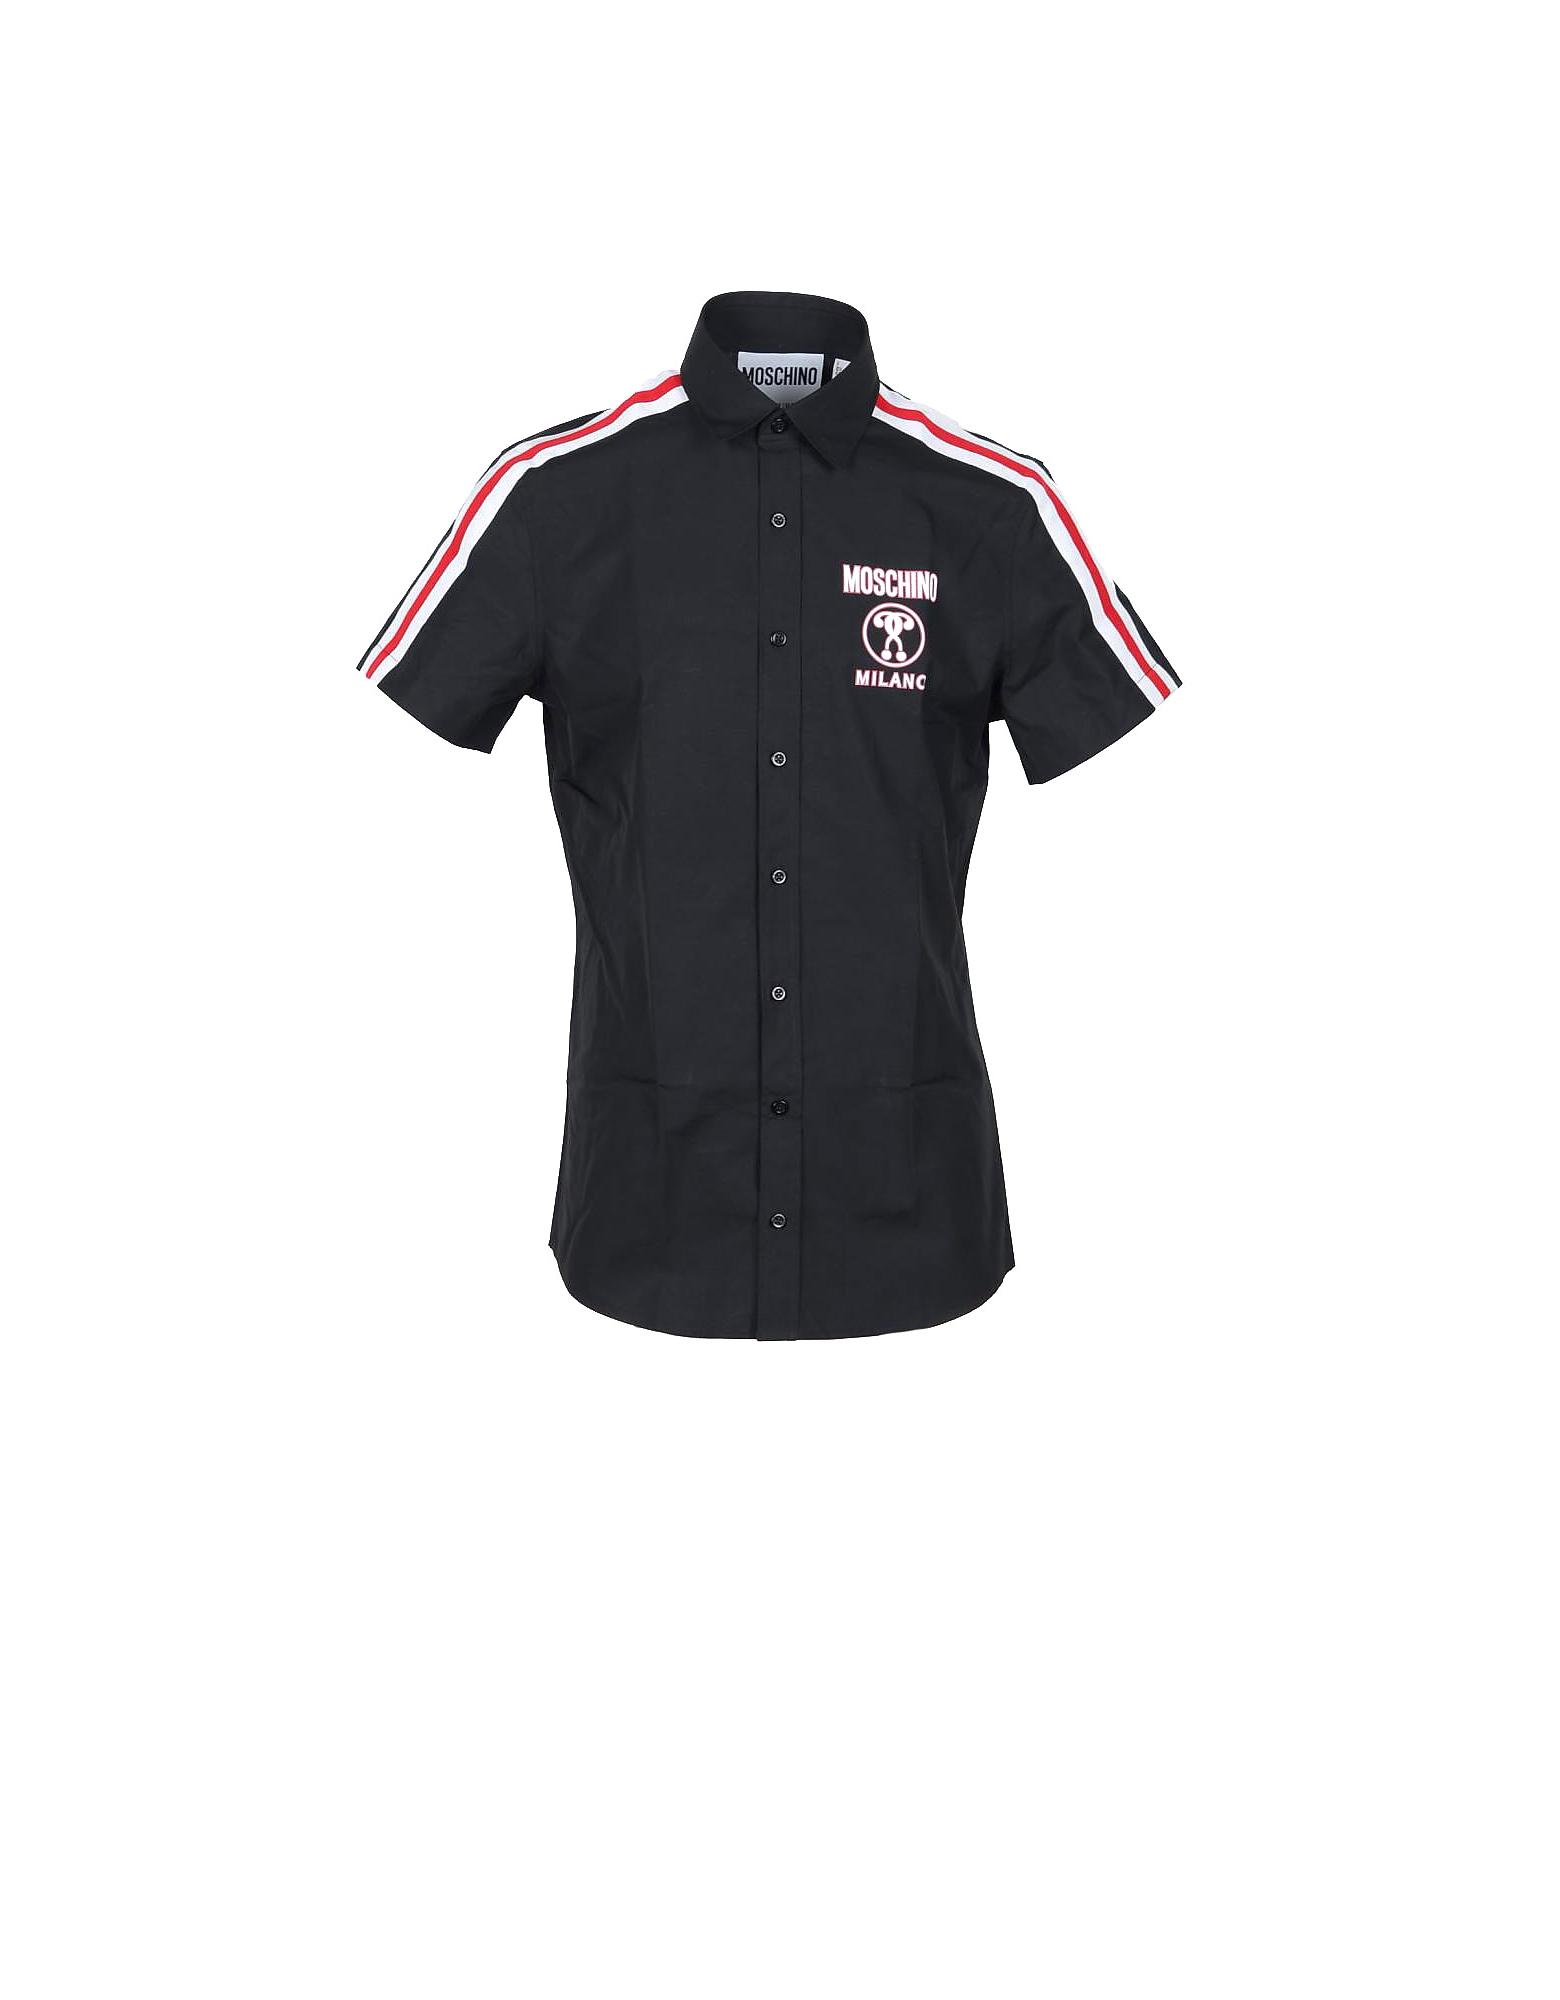 Moschino Designer Shirts, Signature Black Cotton Striped and Signature Short Sleeve Men's Shirt